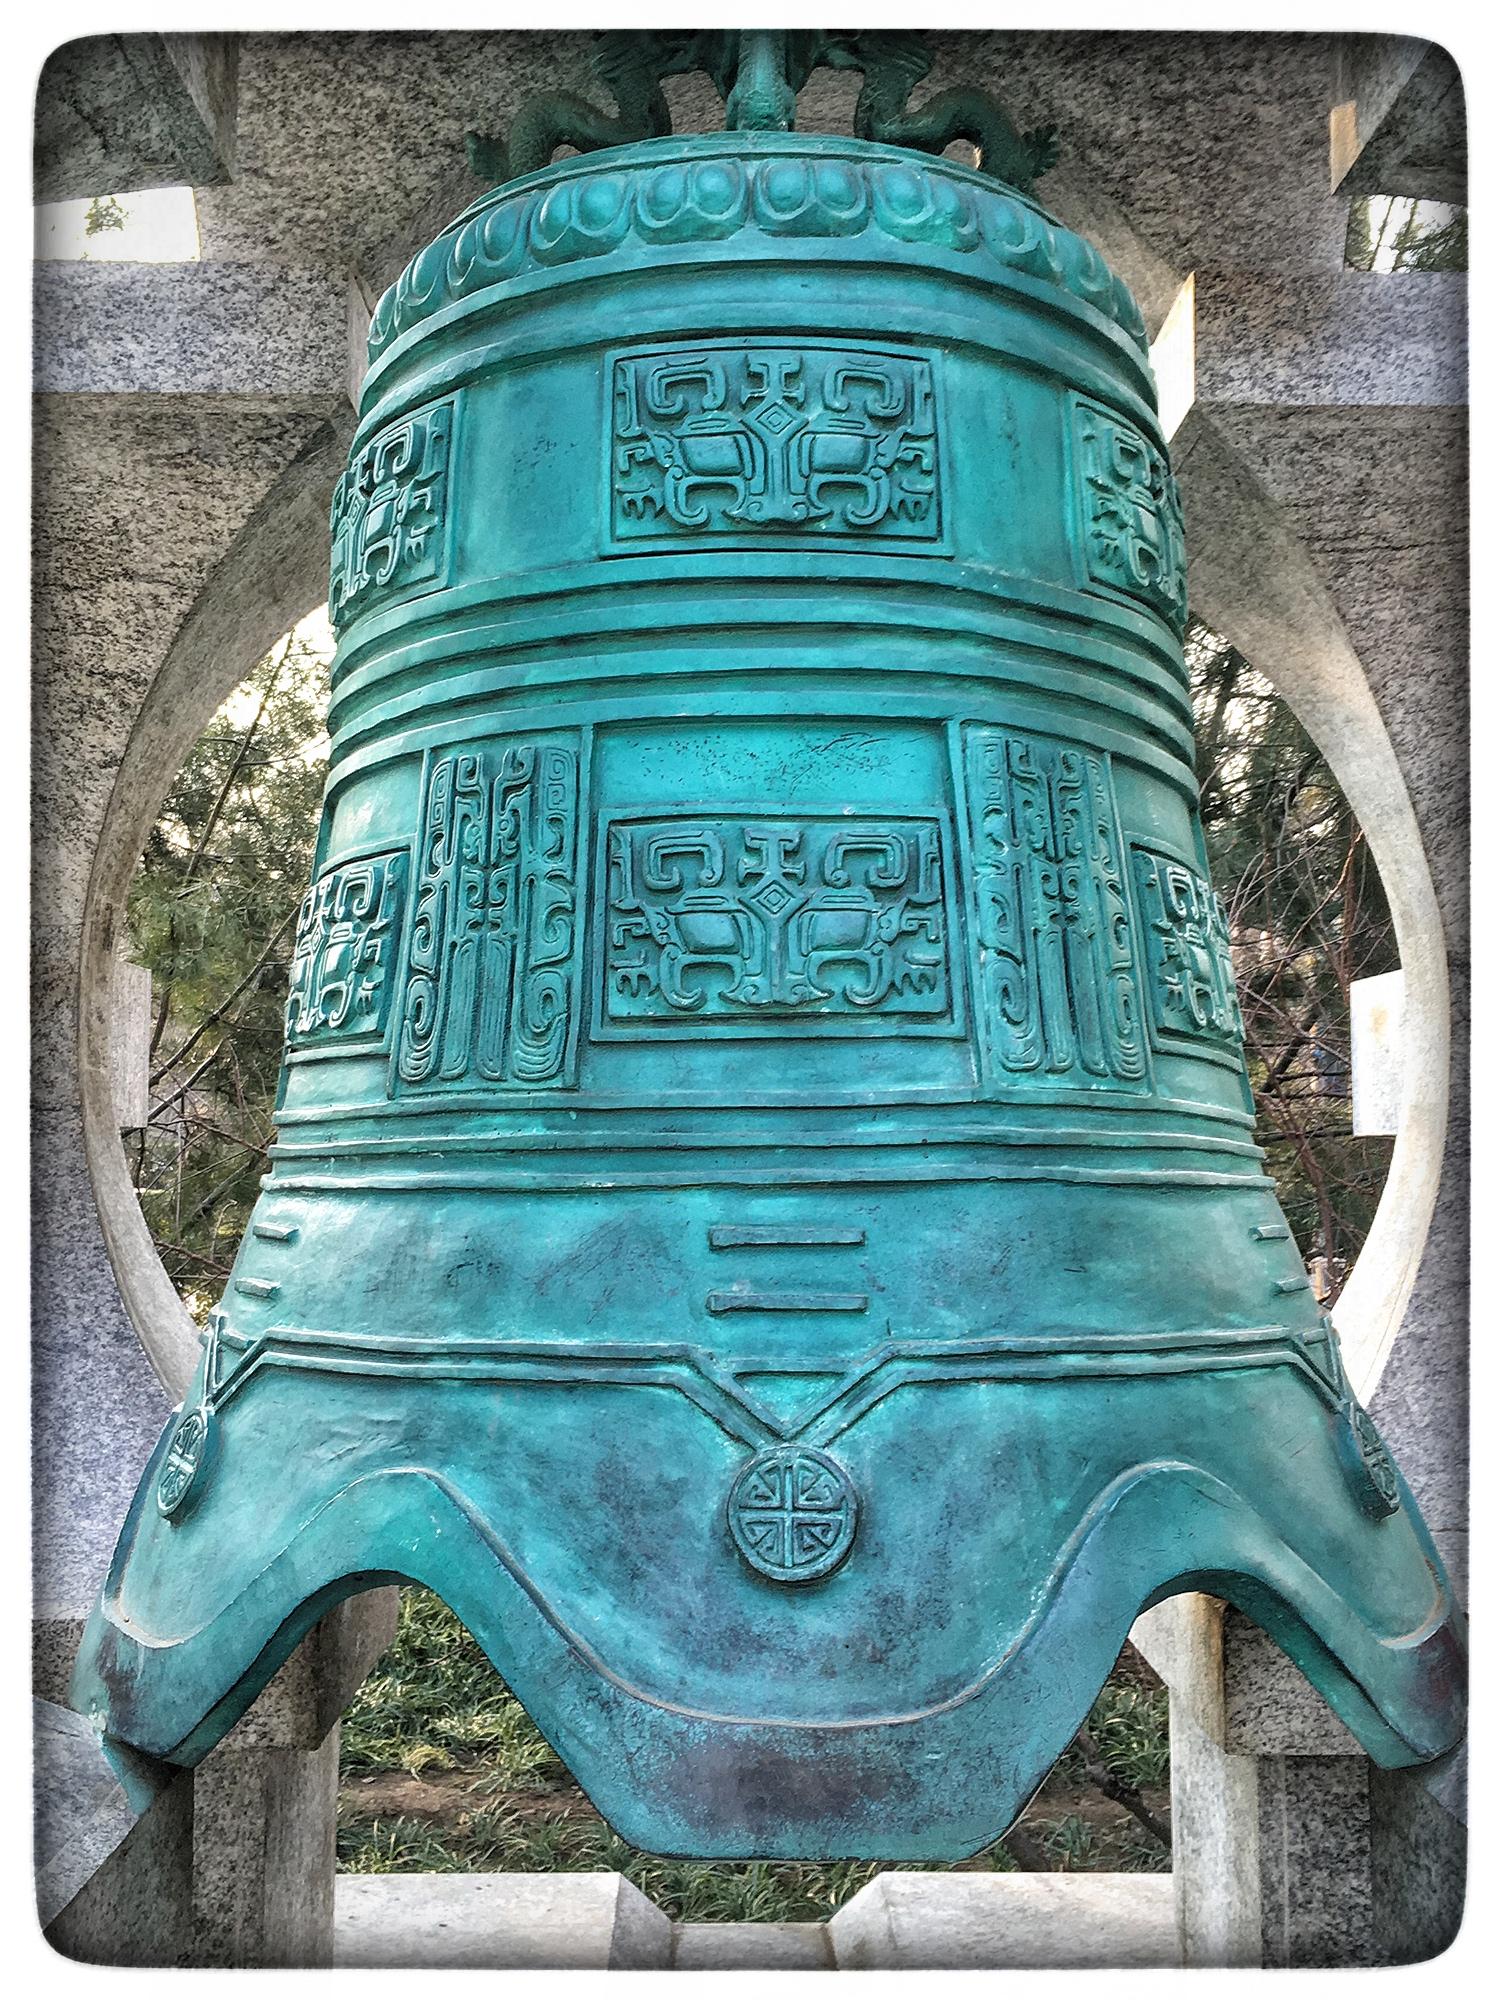 Beijing park bell